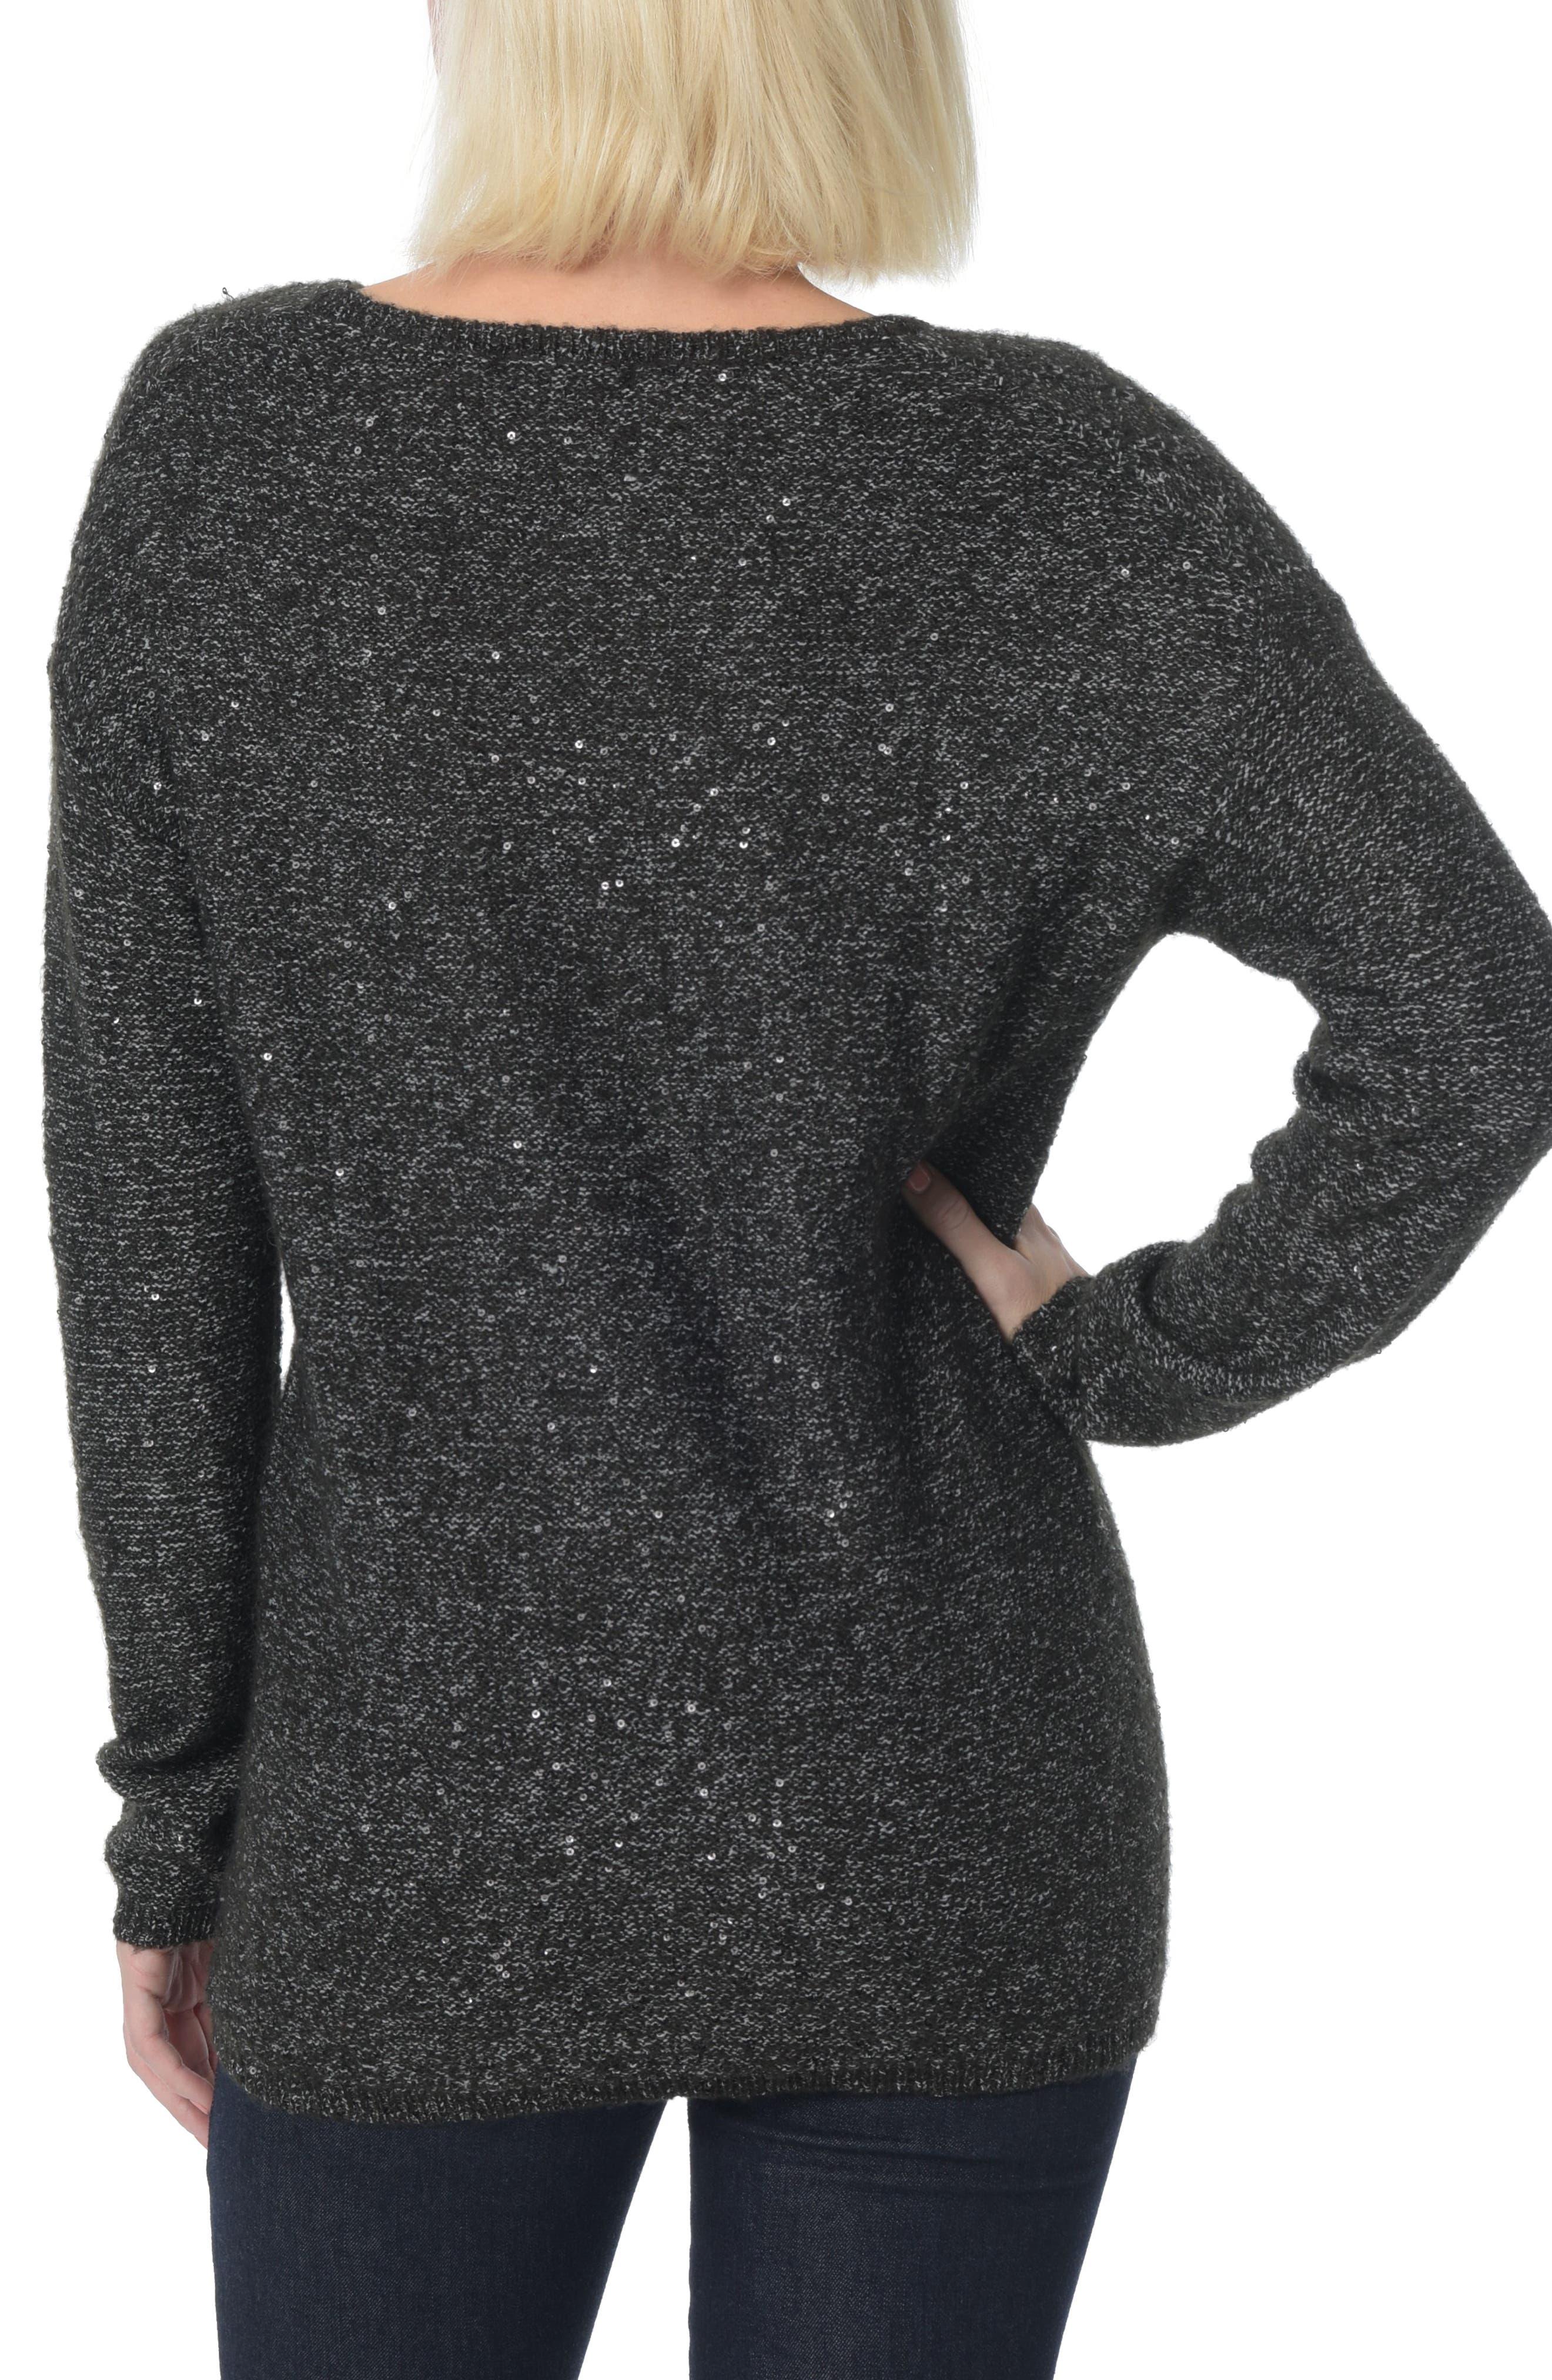 Sequin Scoop Neck Sweater,                             Alternate thumbnail 2, color,                             001